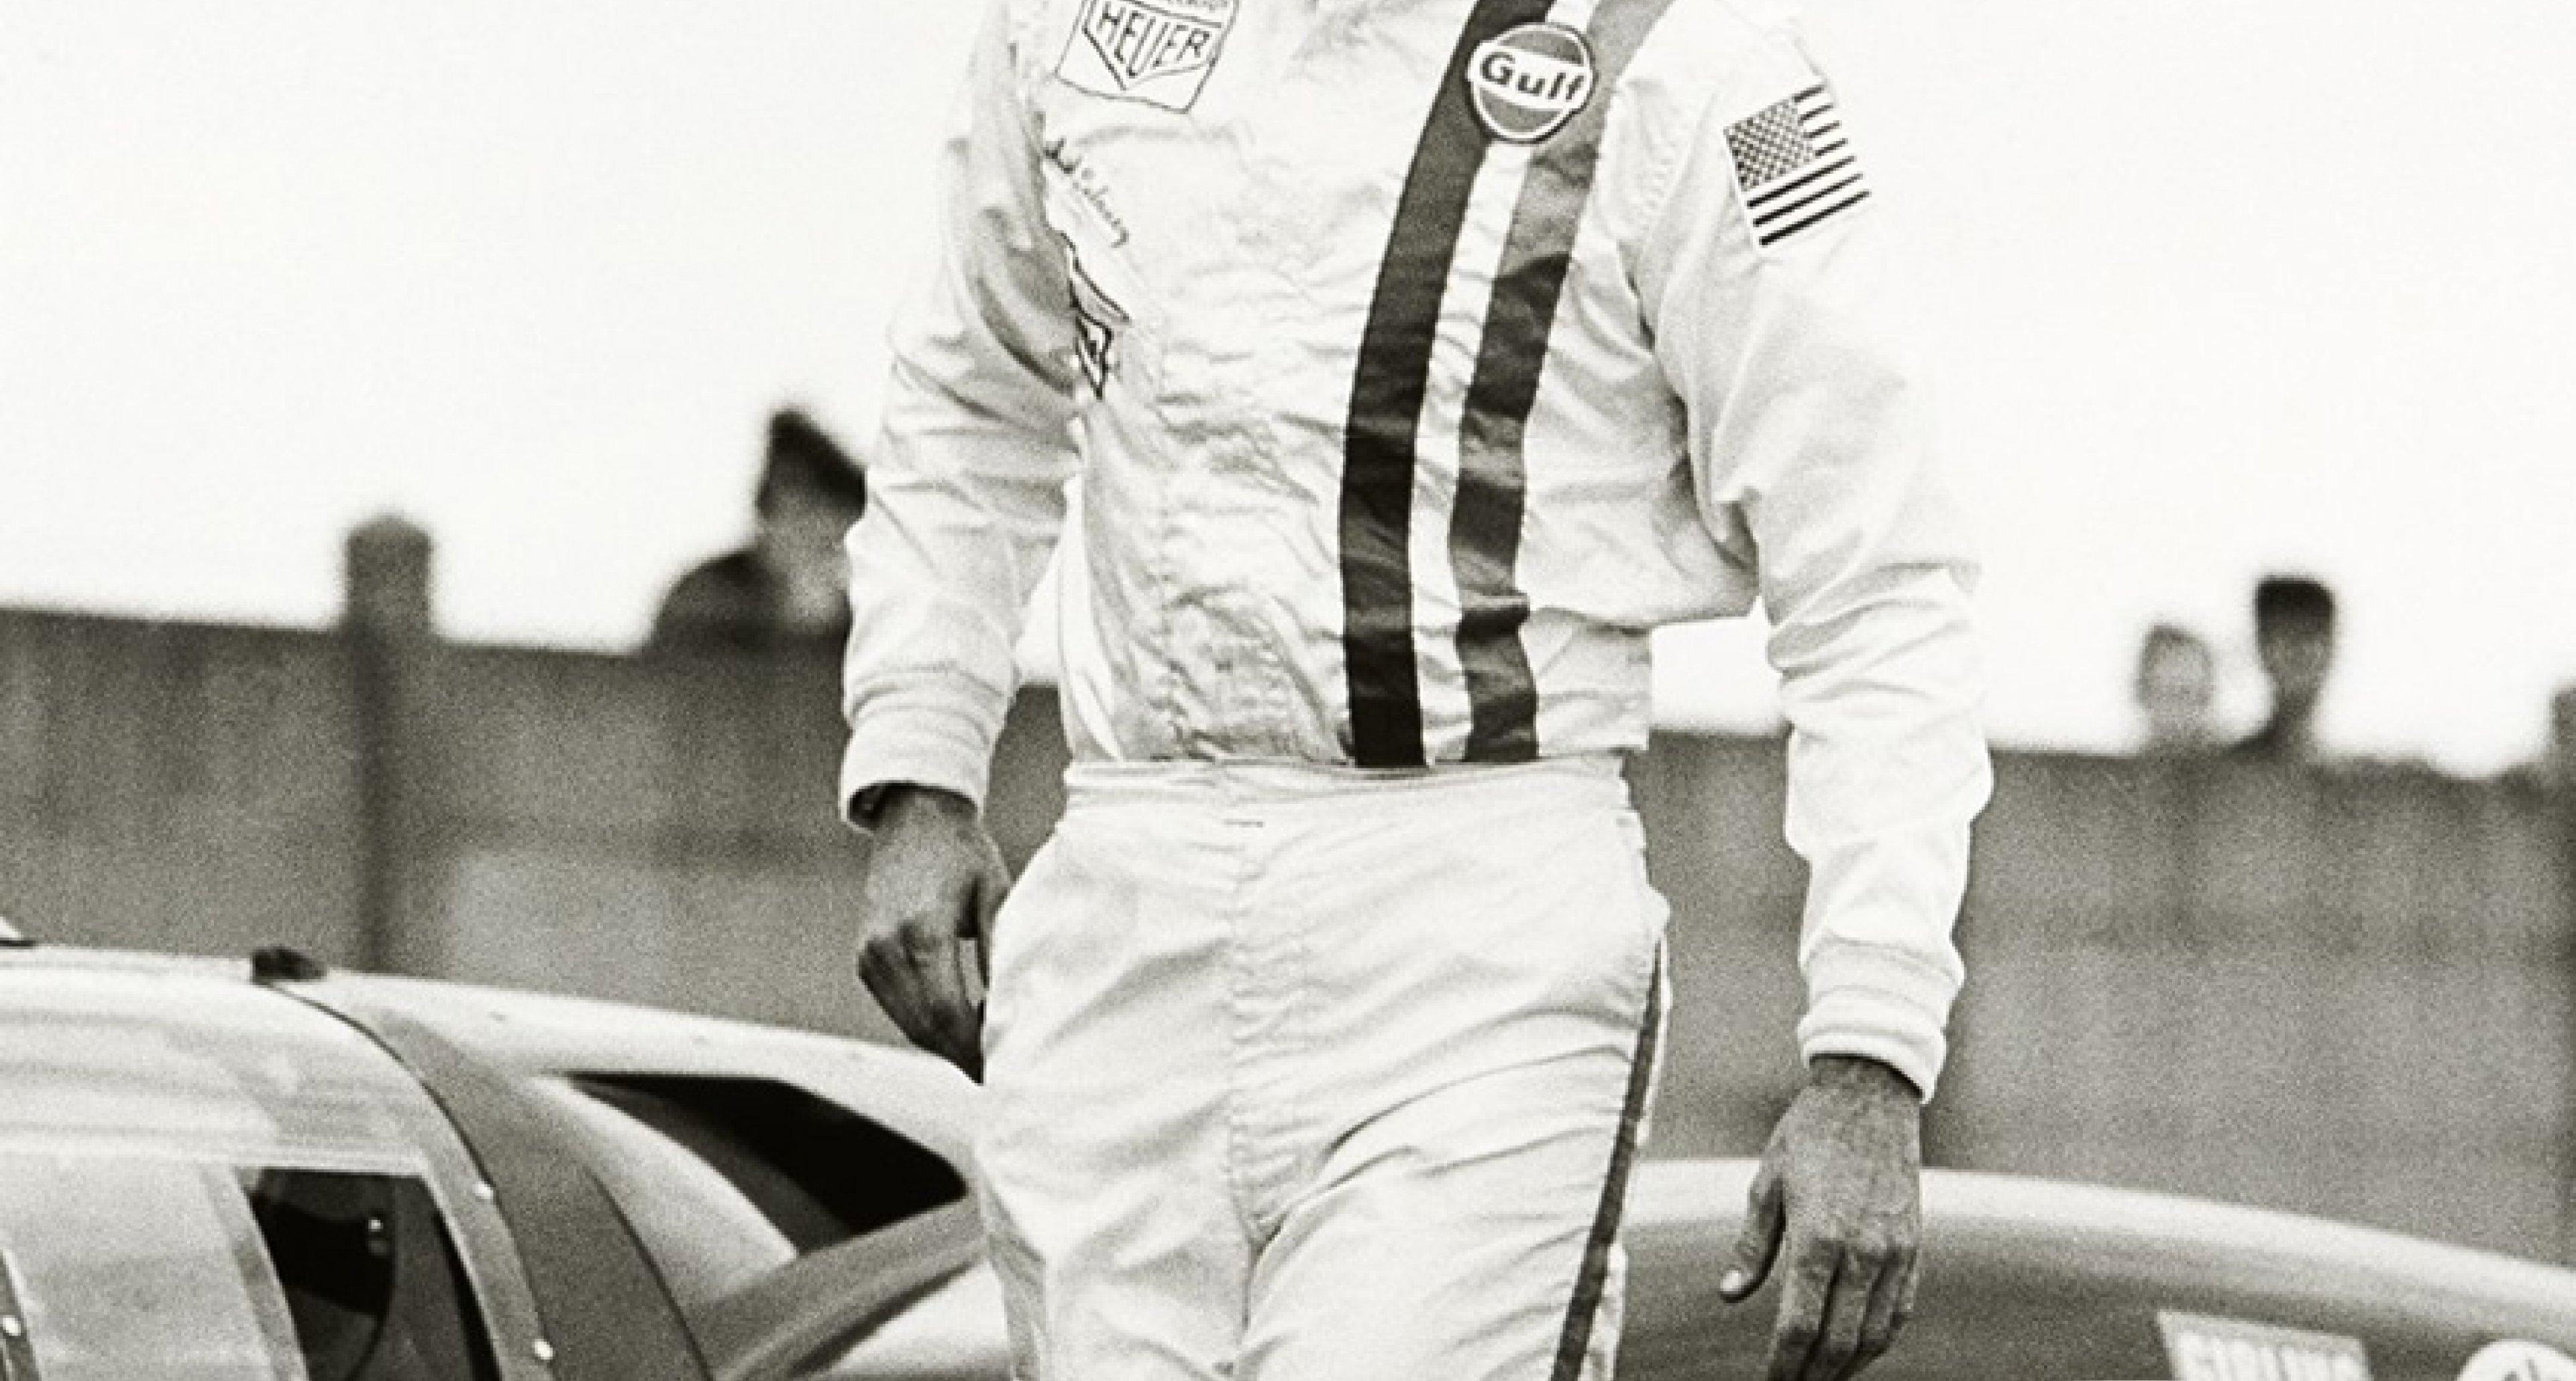 Steve Mcqueen memorabilia at Artcurial's 2014 Le Mans Classic auction